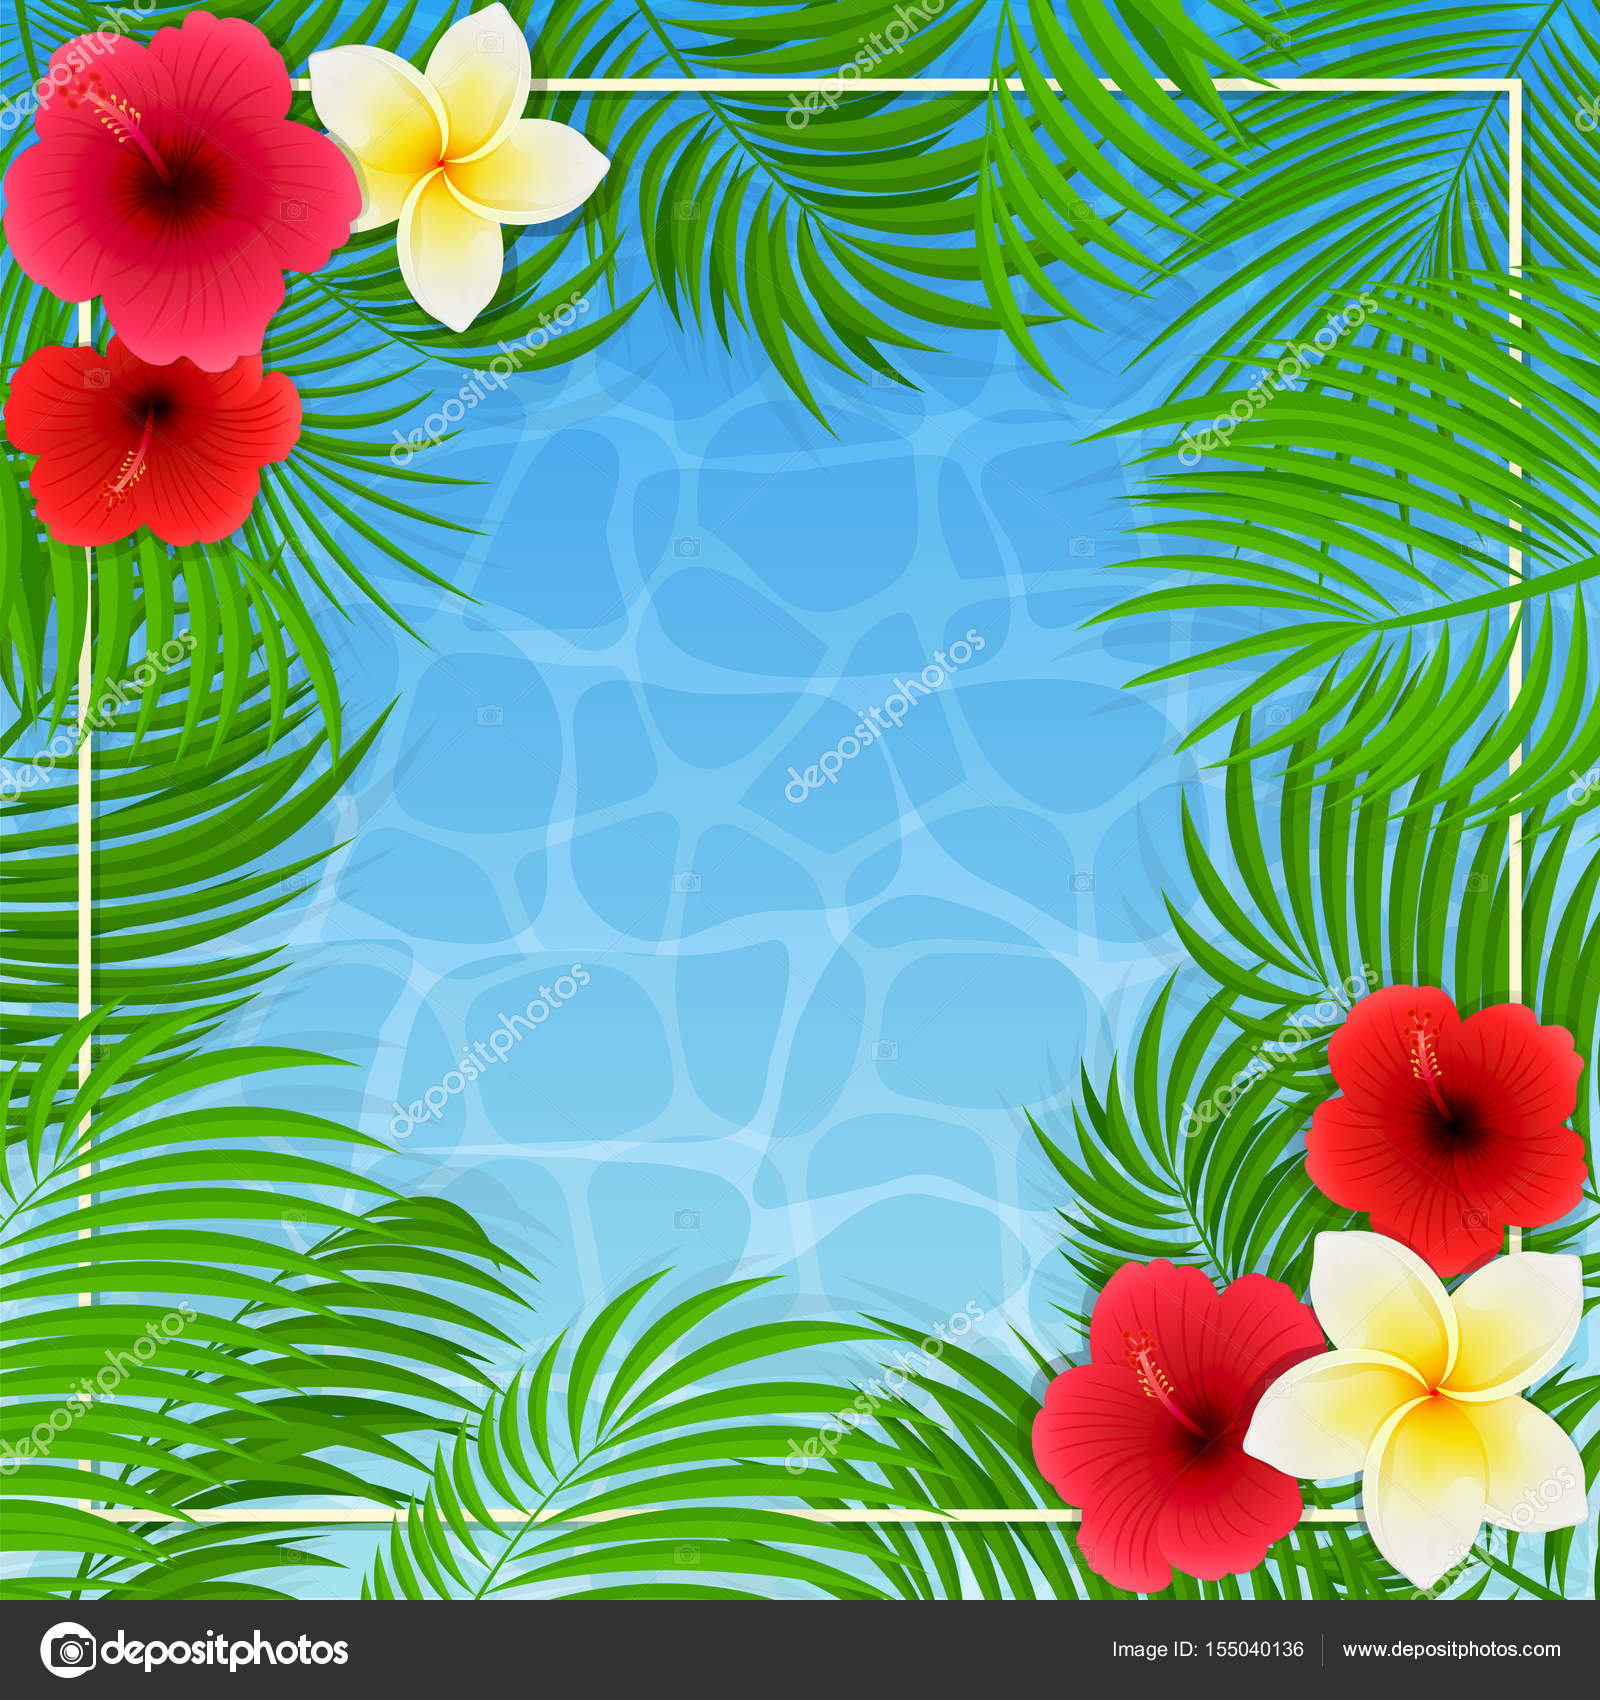 Hawaiian flowers and palm leaves on water background stock vector hawaiian flowers and palm leaves on water background stock vector izmirmasajfo Choice Image